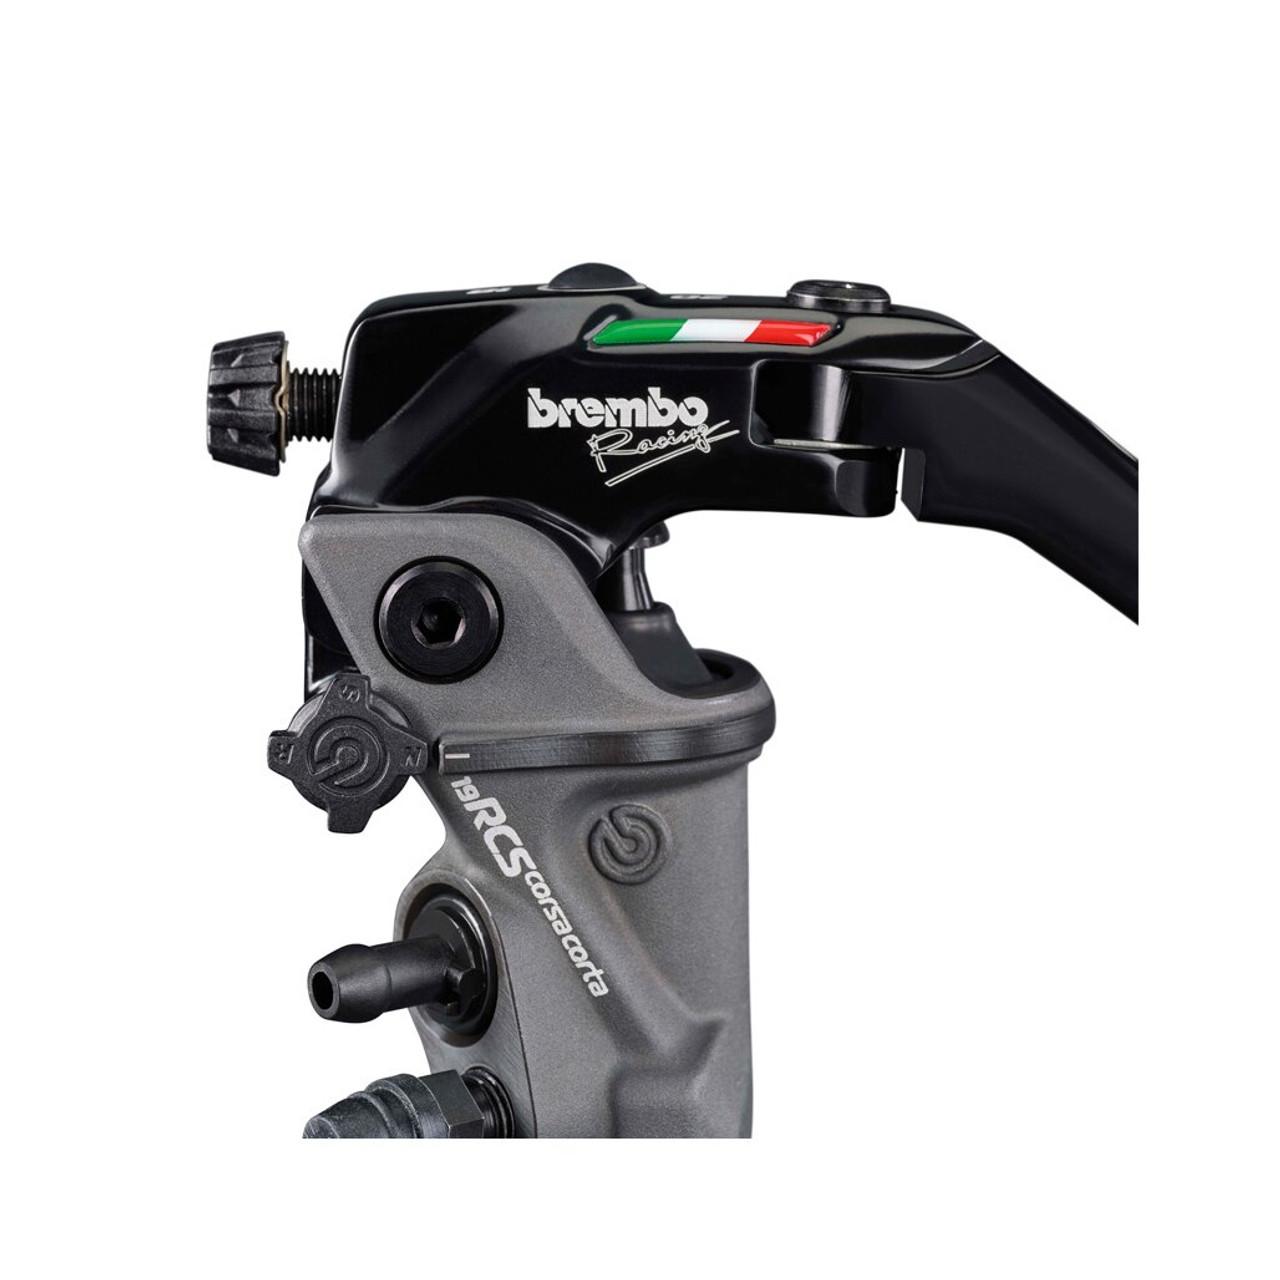 Brembo 17 RCS brake master cylinder top detail